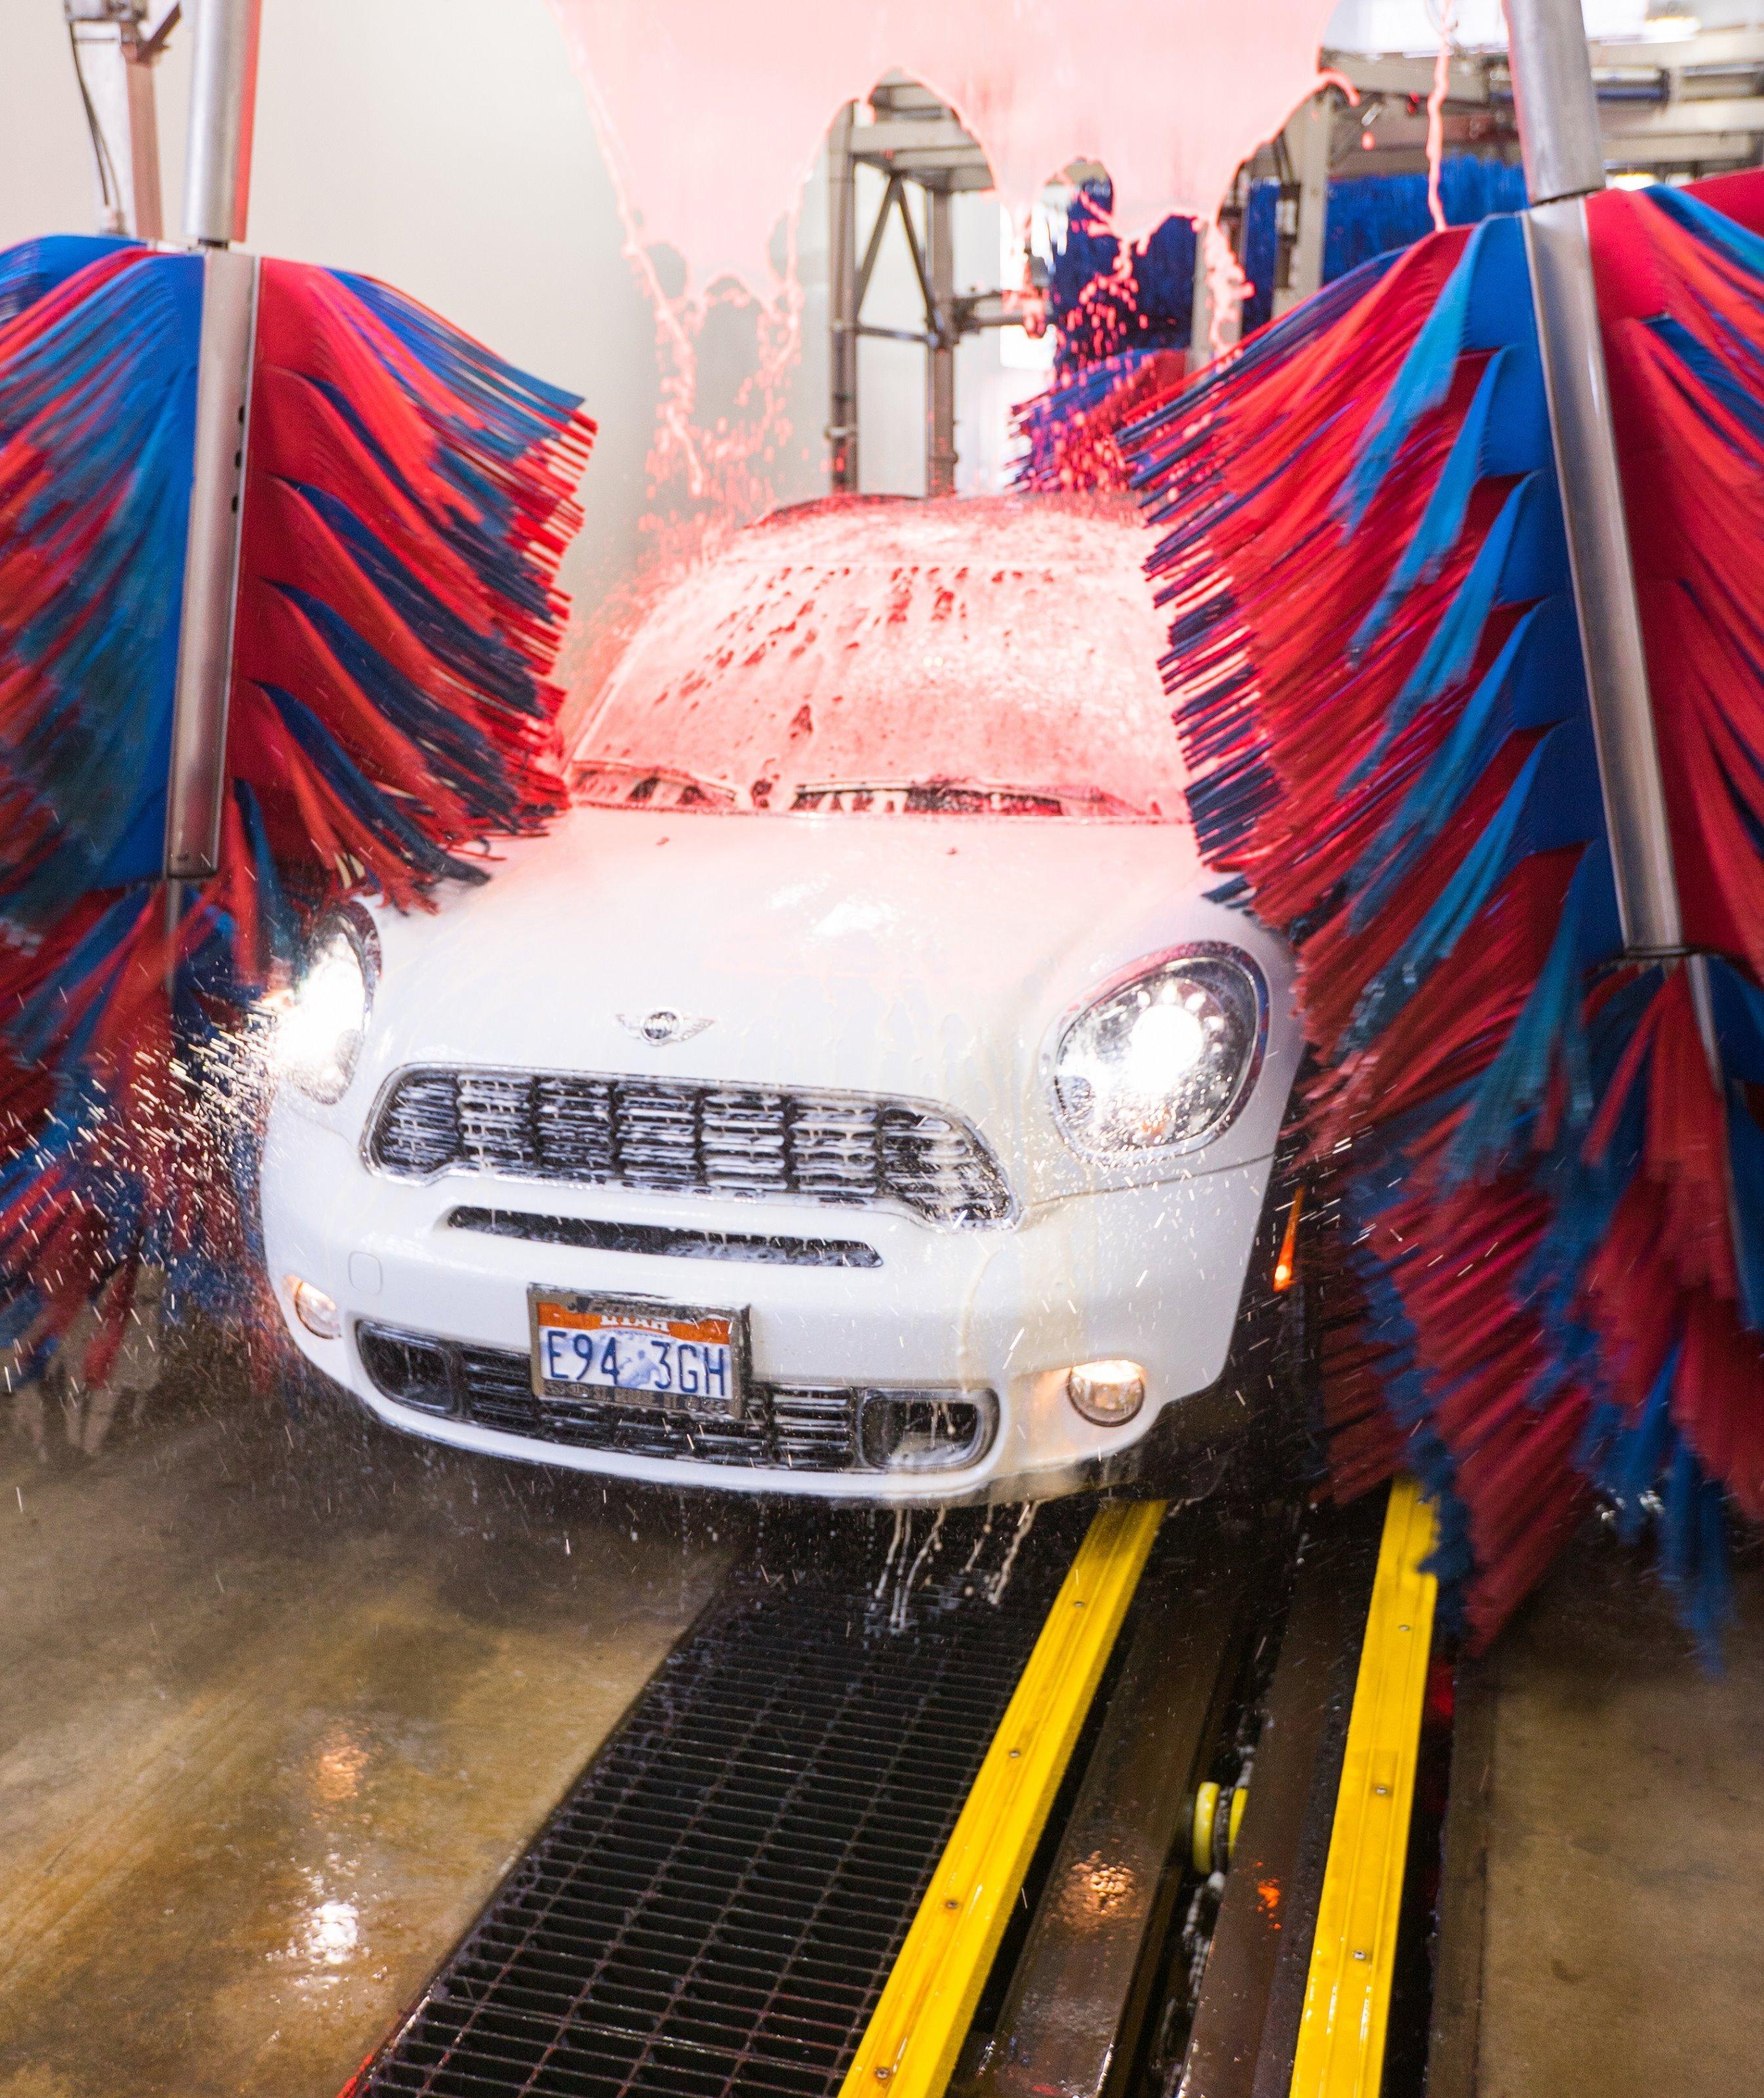 Tagg N Go Express Car Wash image 4